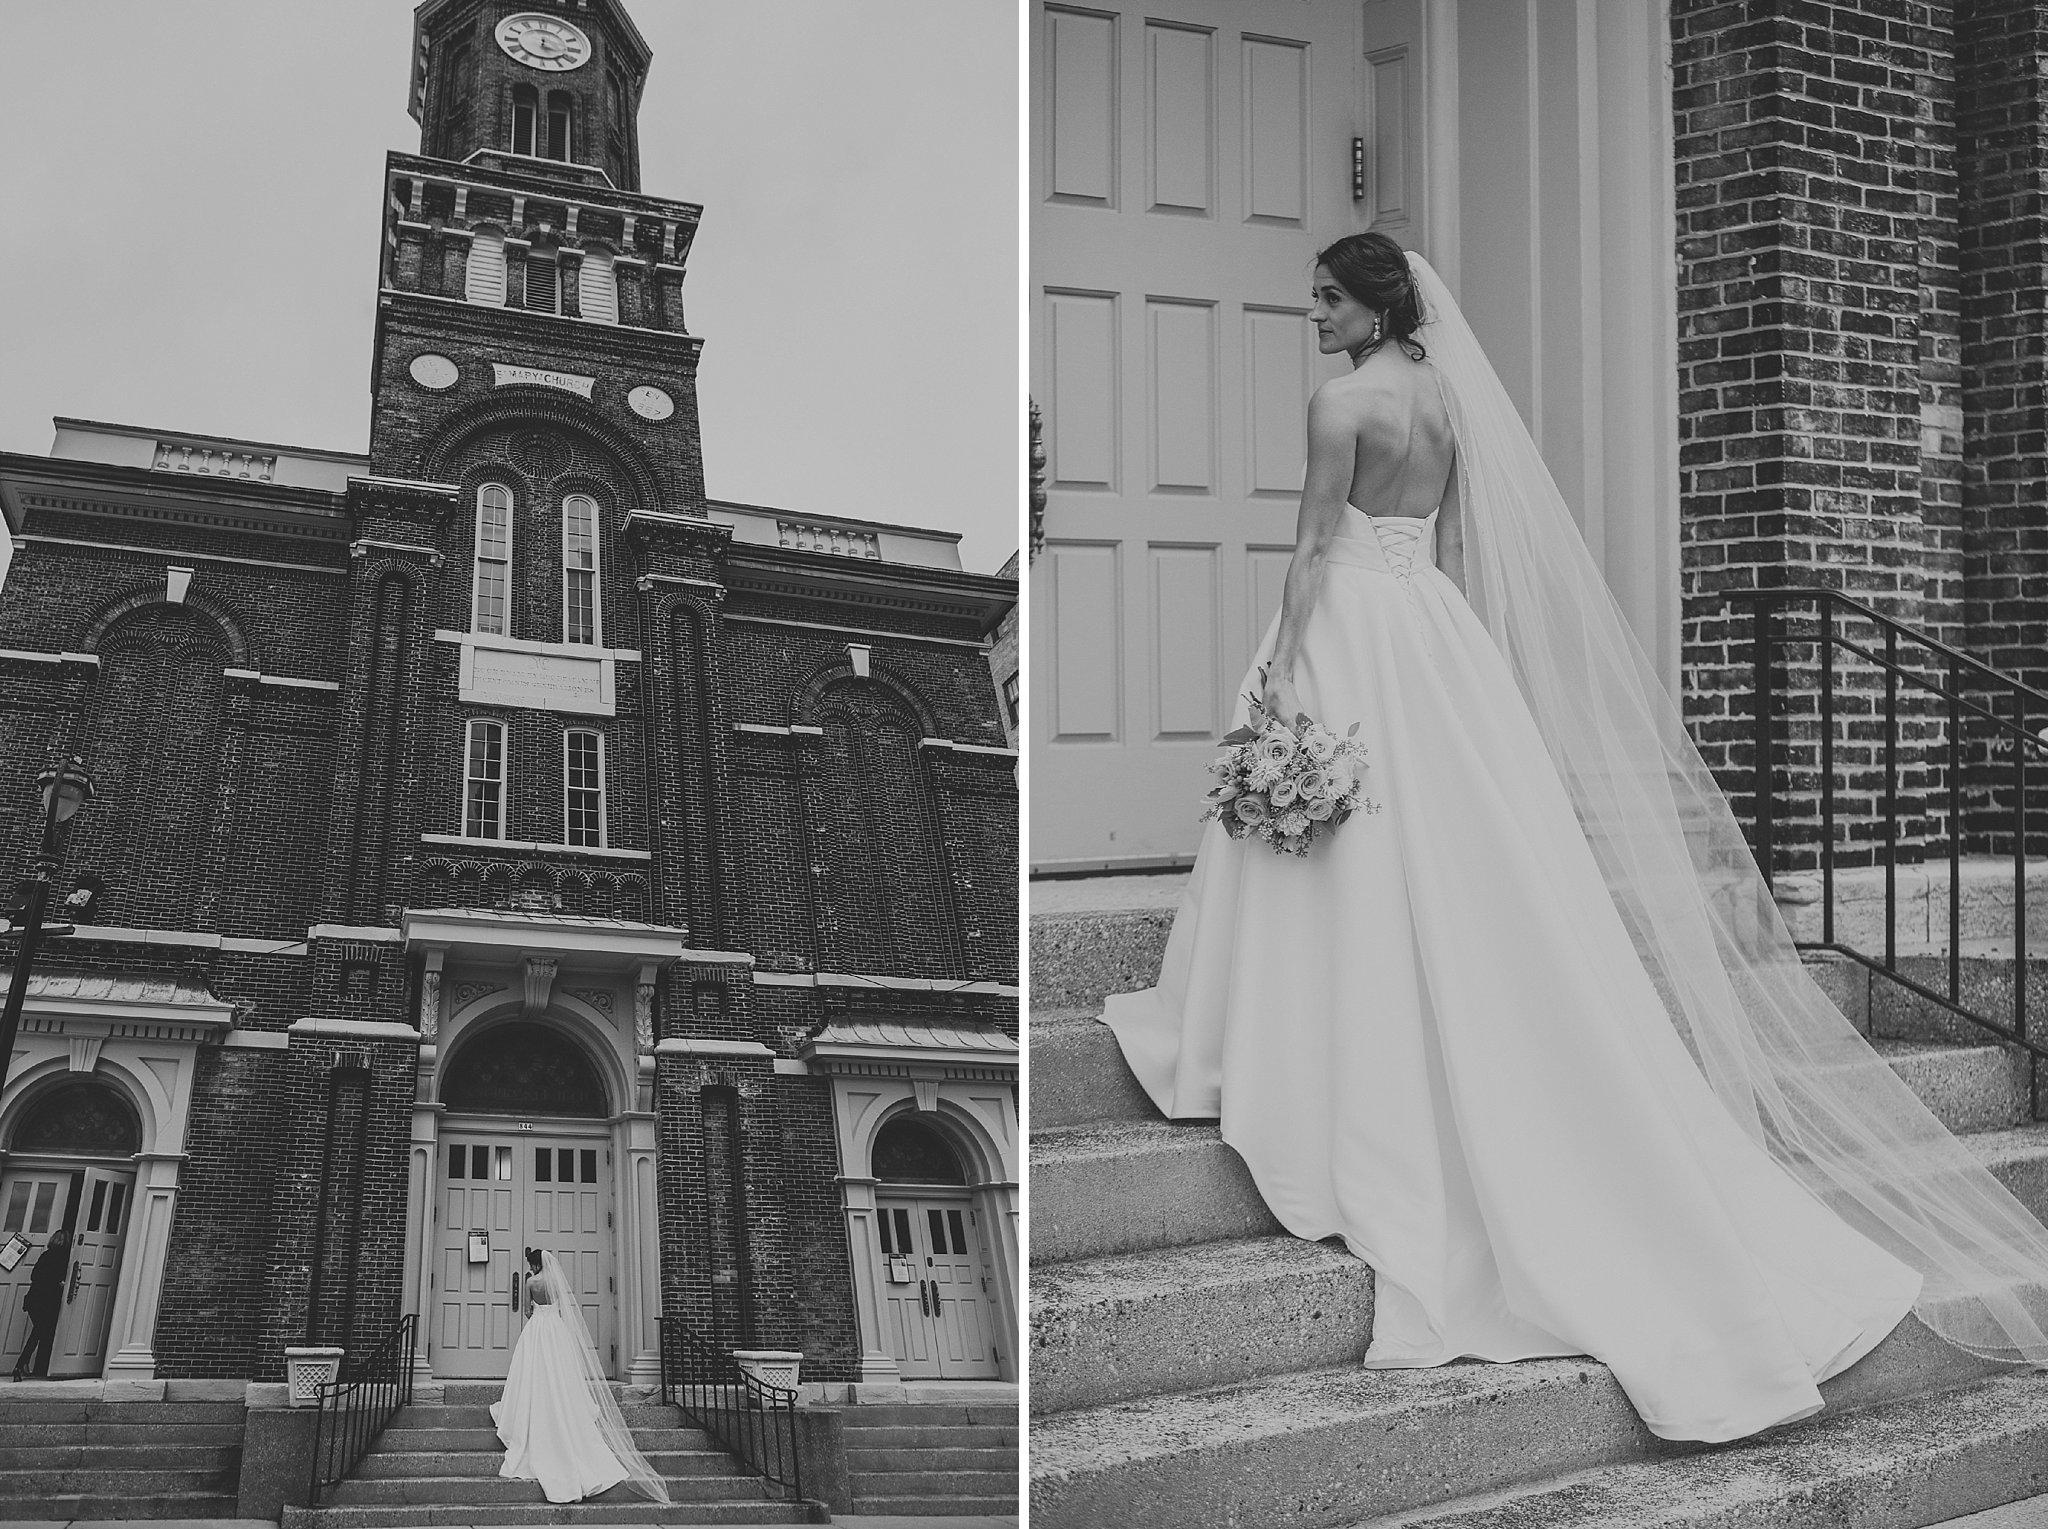 Matt-Lauren_St-Marys_Hilton-City-Center-Milwaukee-Wedding_liller-photo_0032.jpg